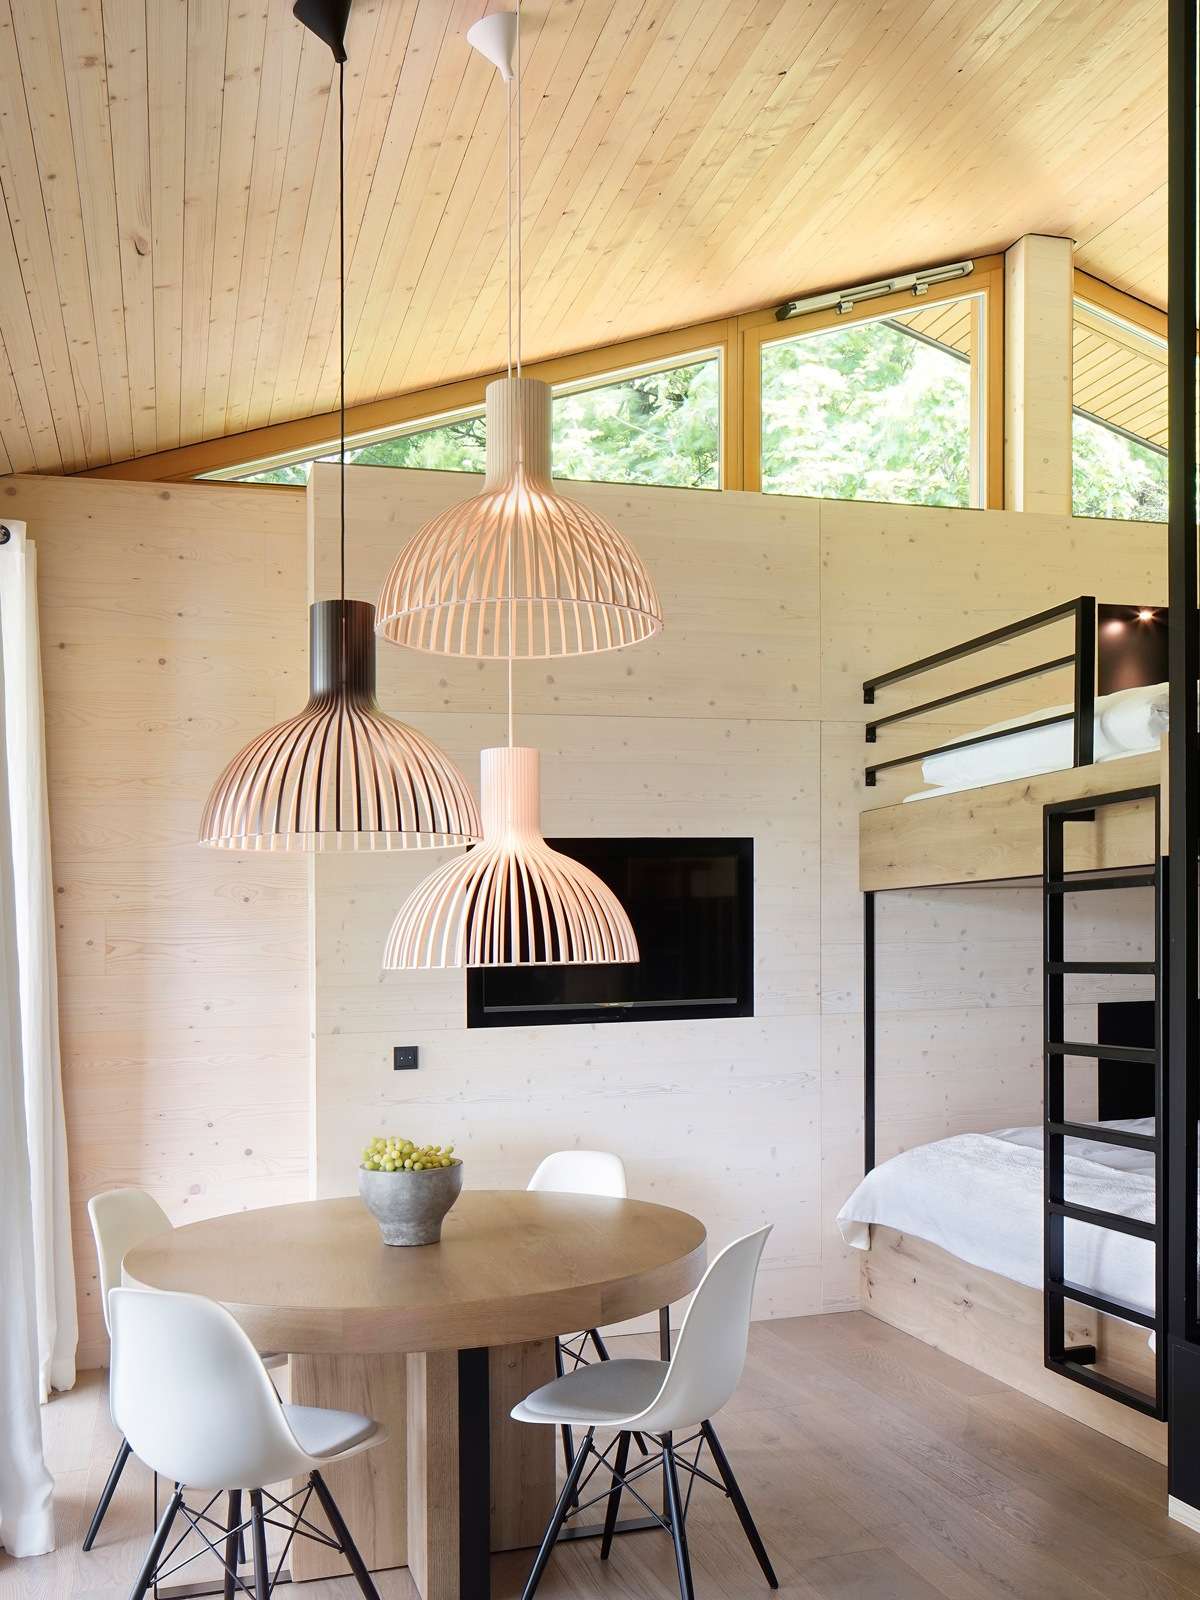 Victo 4250 Holzleuchte Secto Design DesignOrt Onlineshop Lampen Berlin